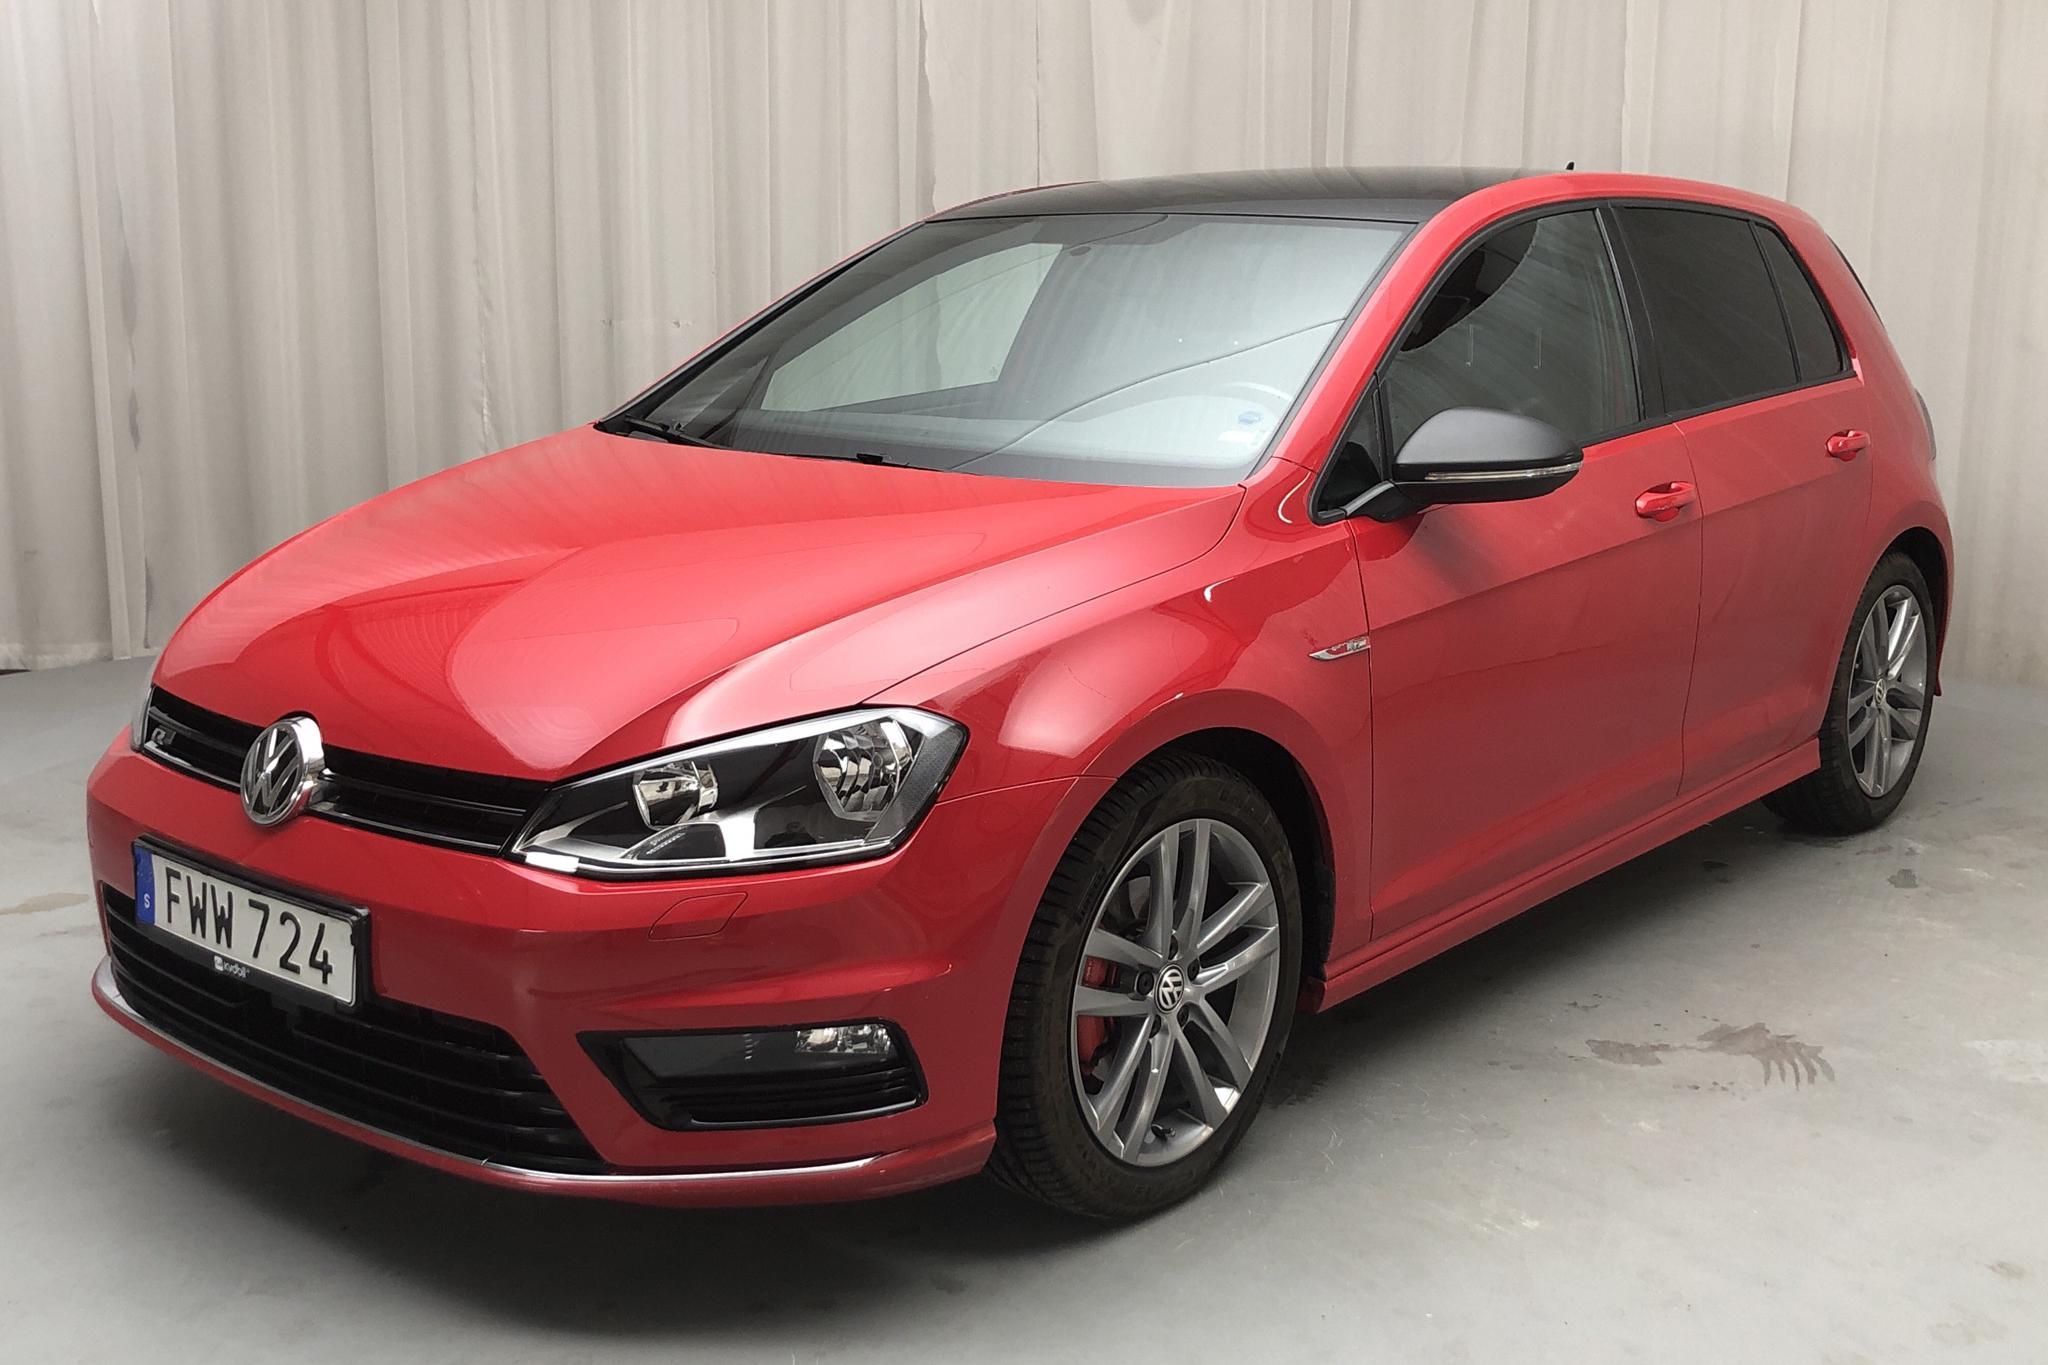 VW Golf VII 1.4 TSI 5dr (150hk)